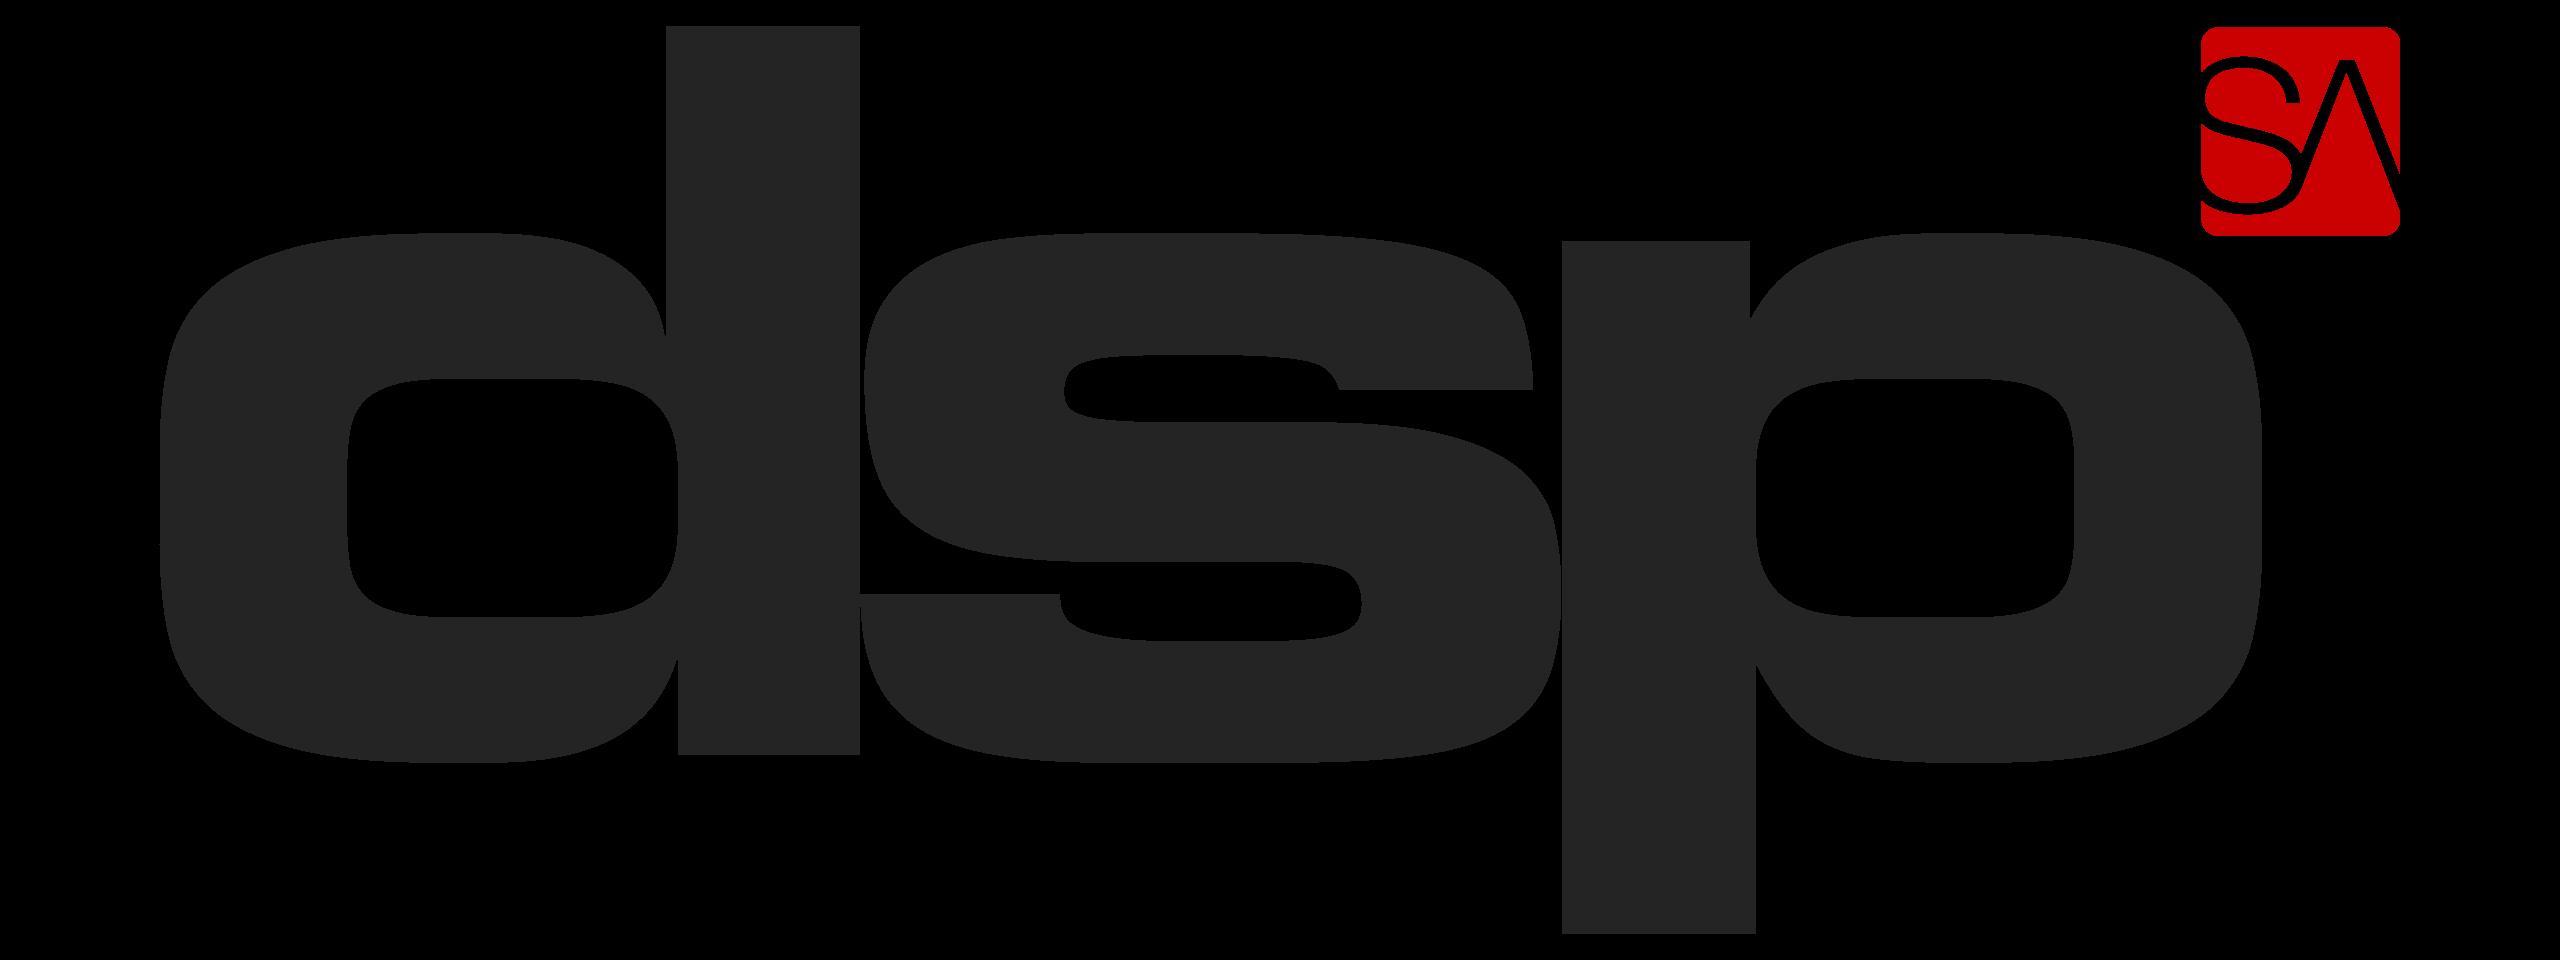 Digital Swiss Partners DSP SA